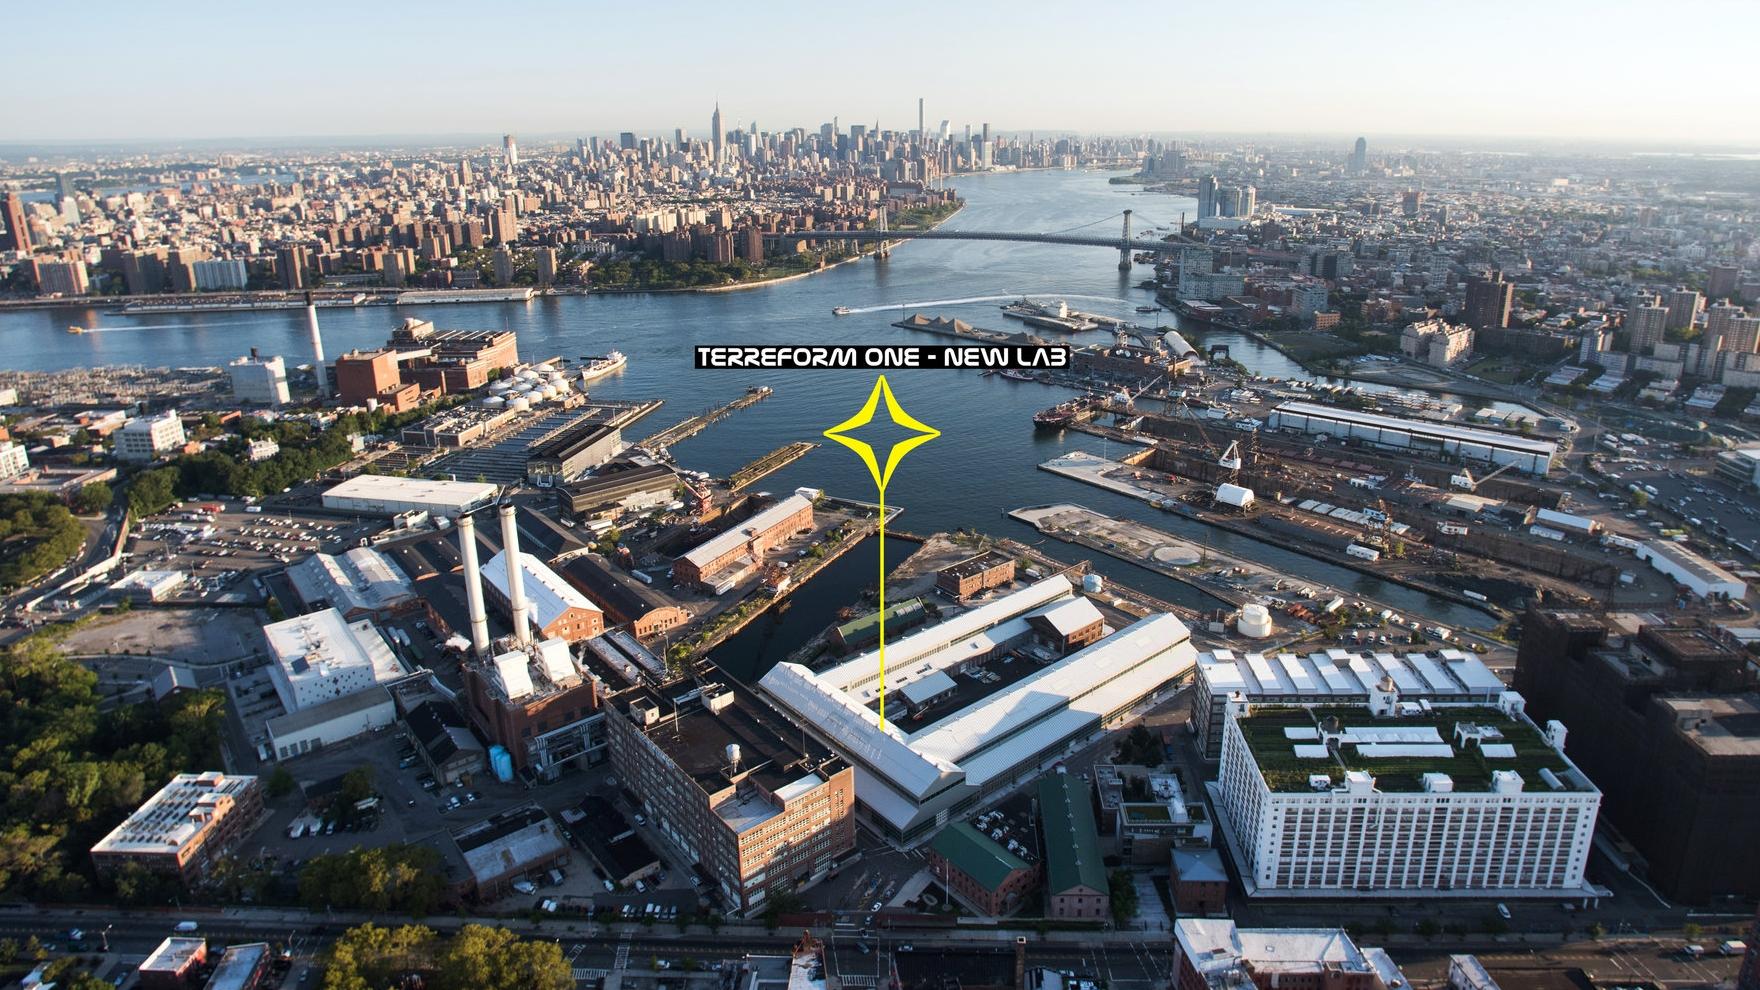 navy-terreform-yard-view.png